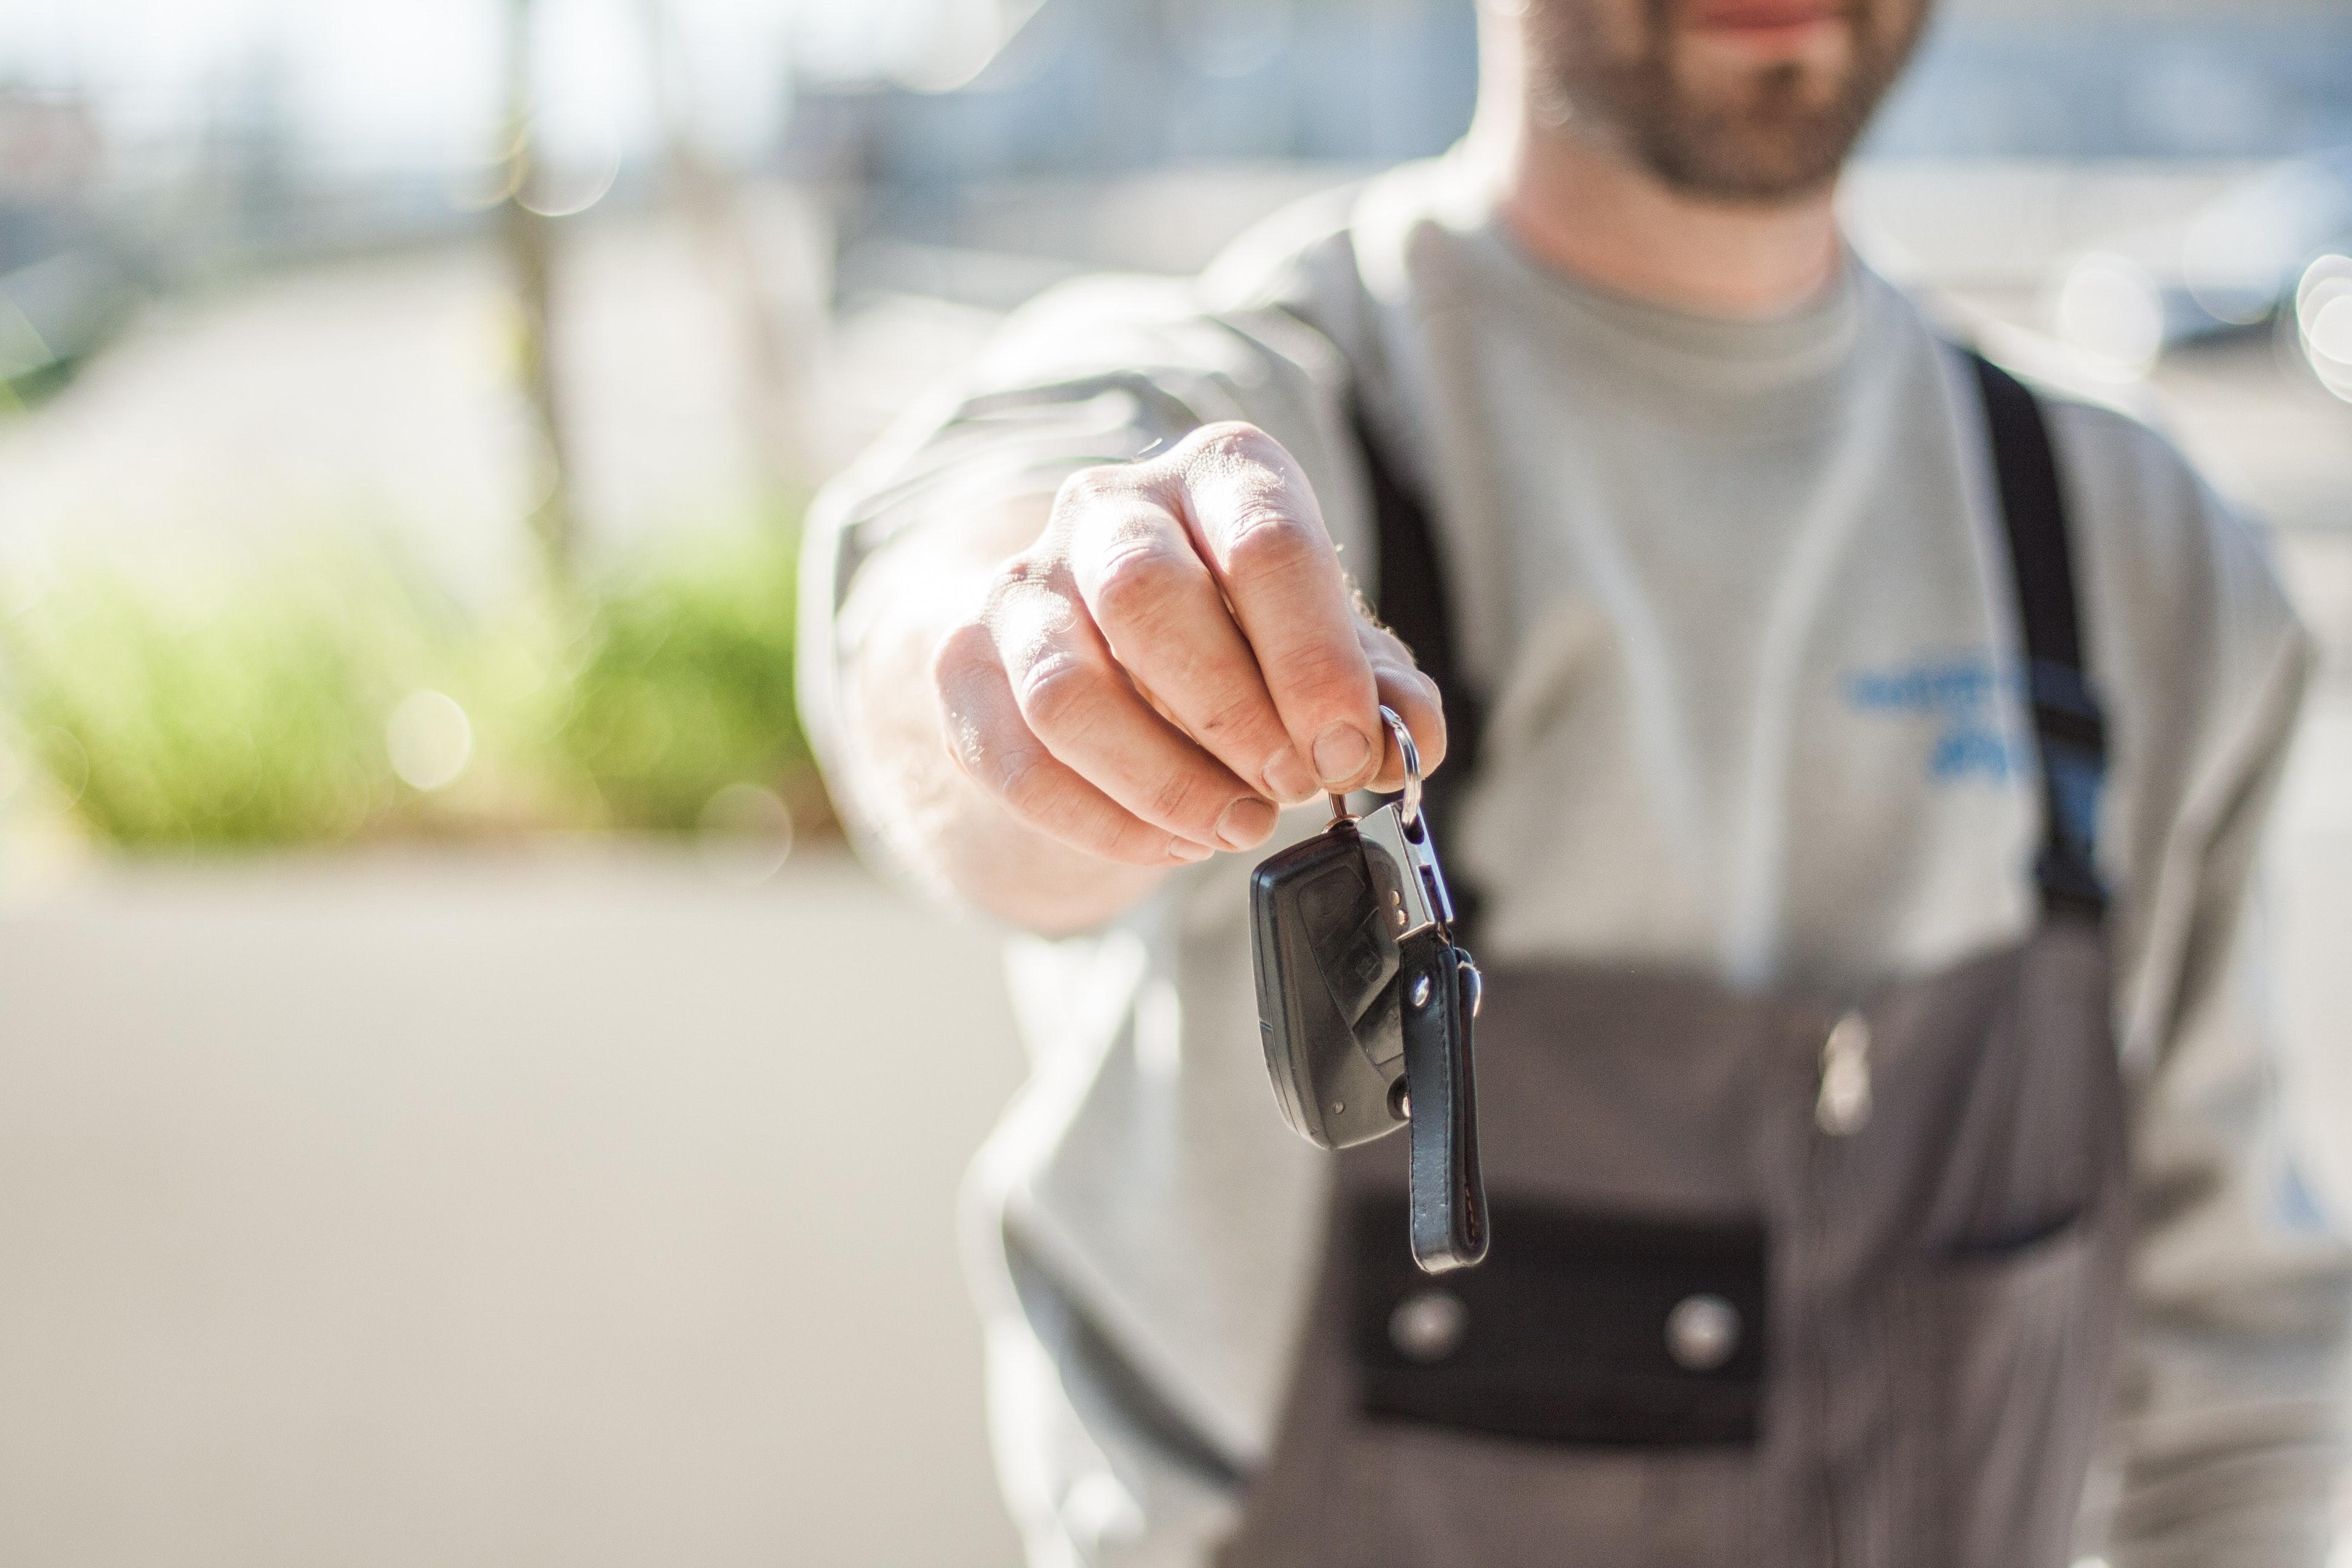 car-buying-car-mechanic-car-purchase-97075